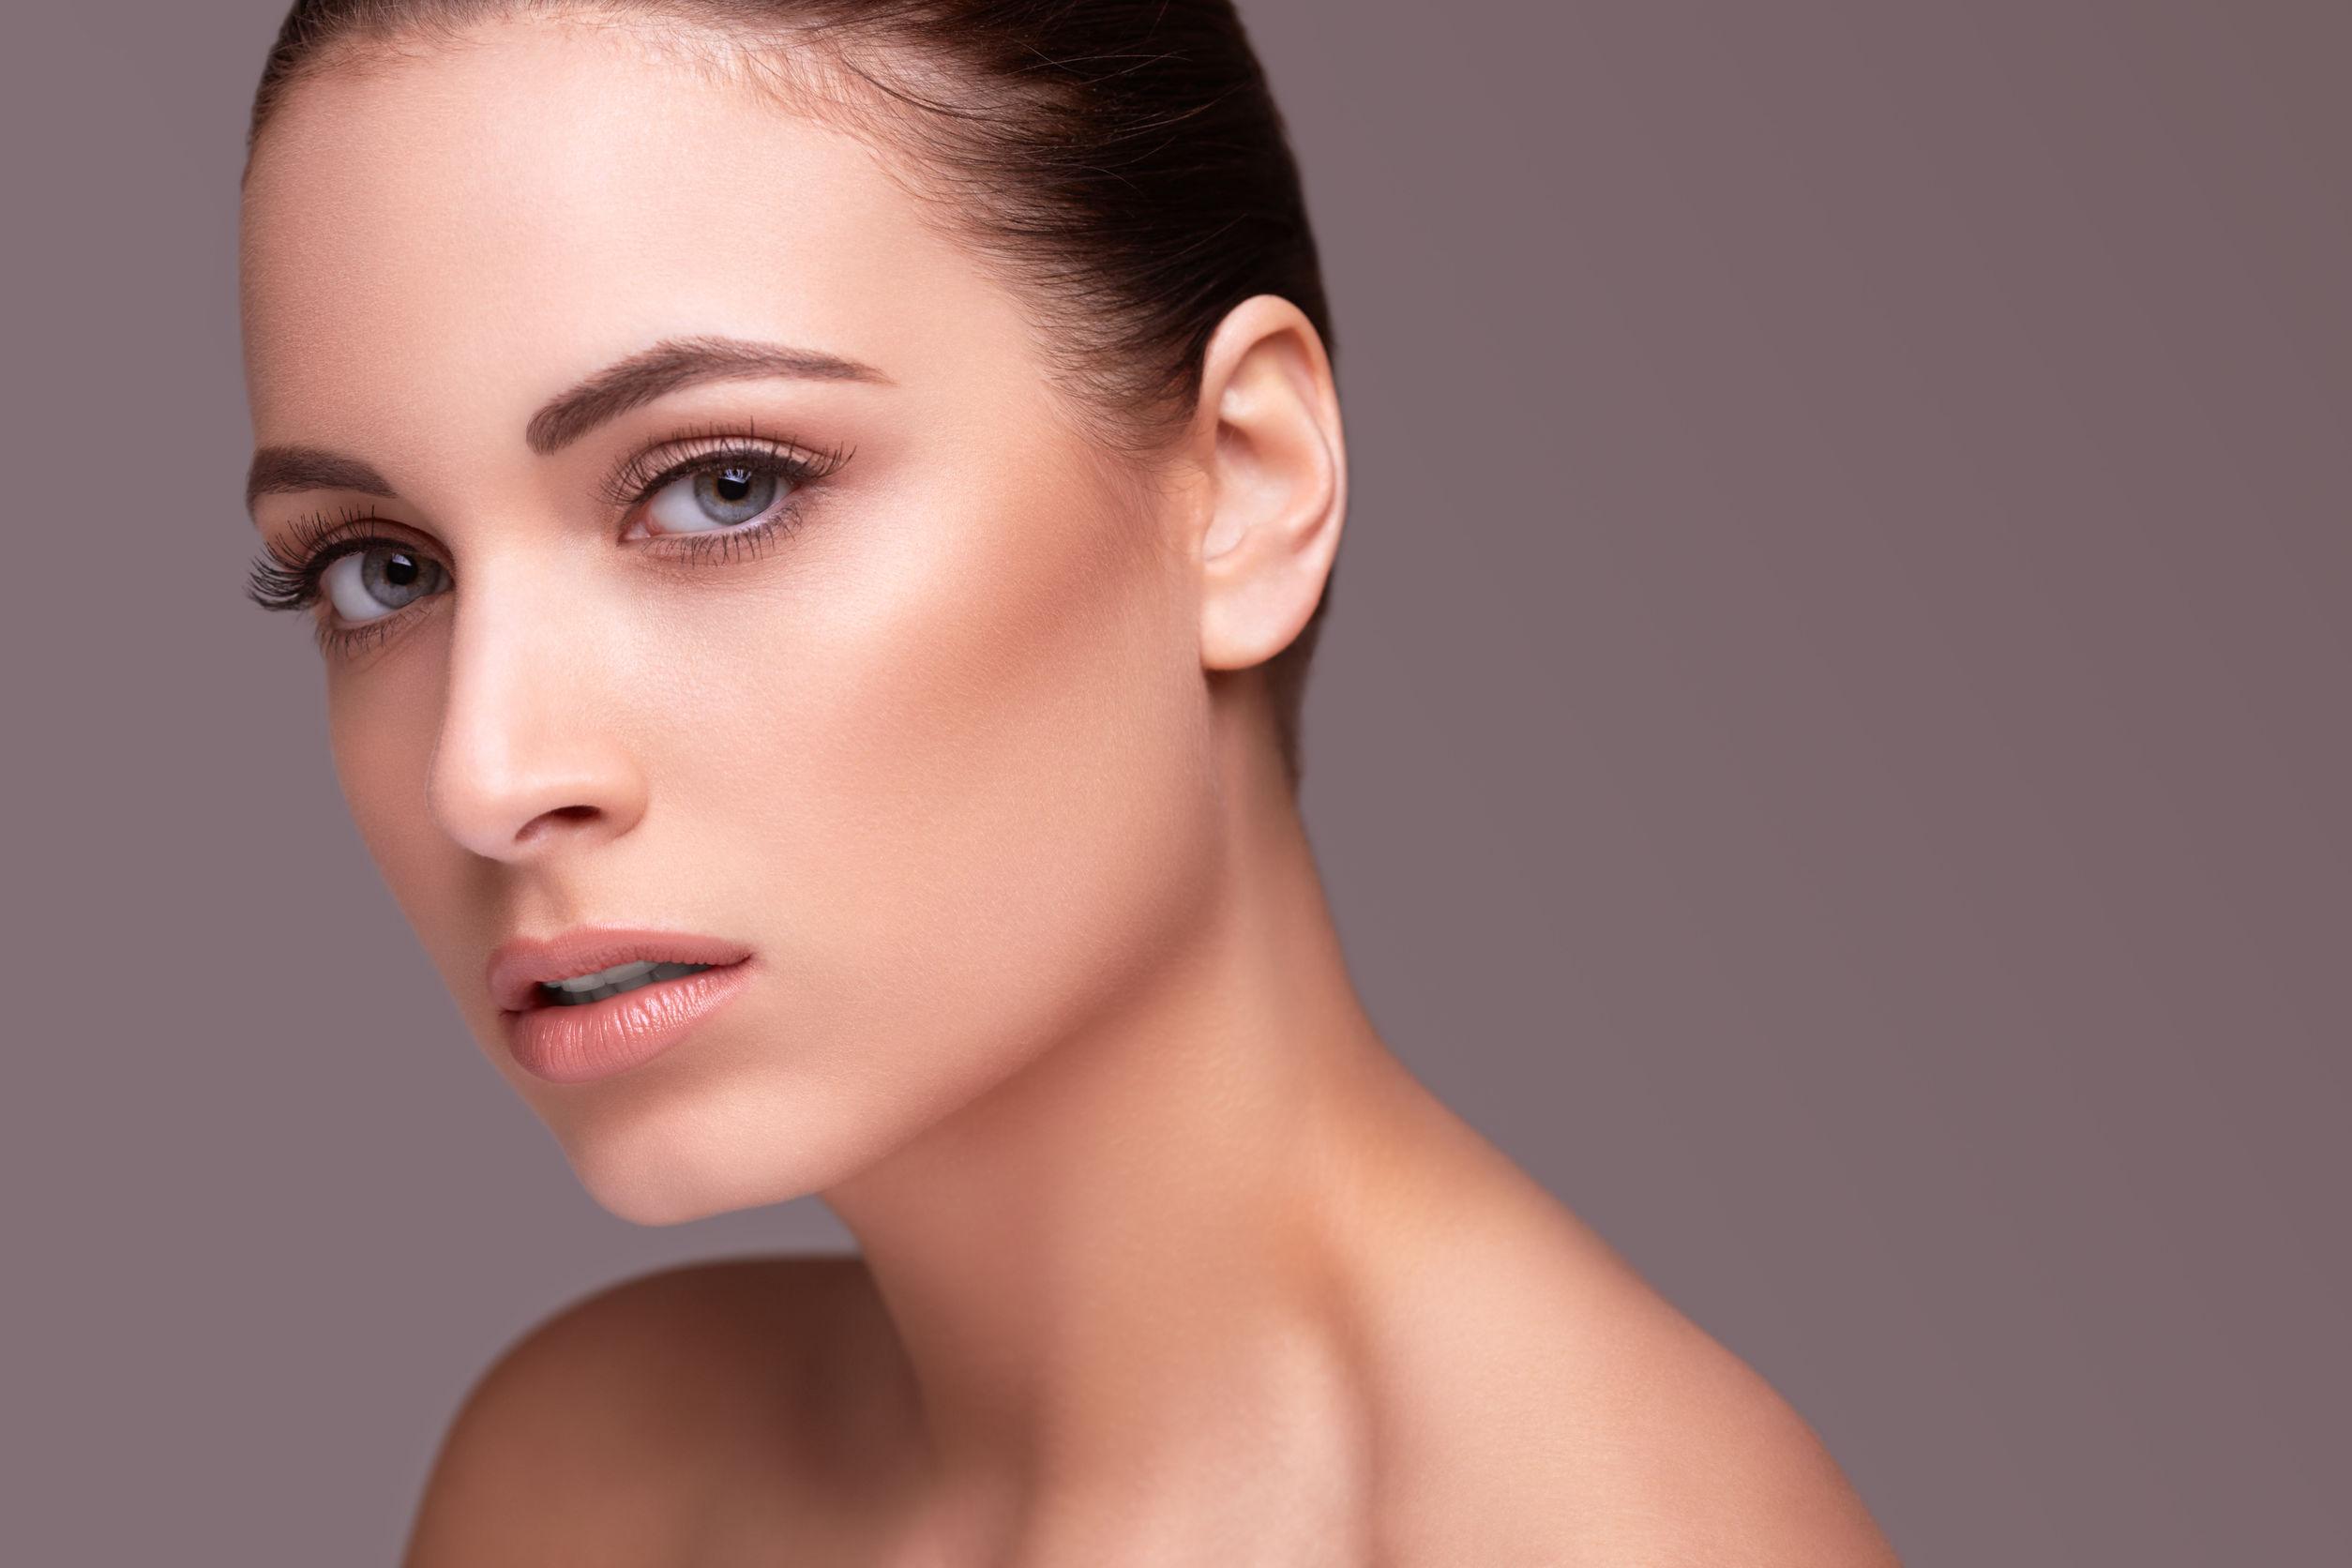 45743454 - beauty shot. beautiful woman with healthy skin